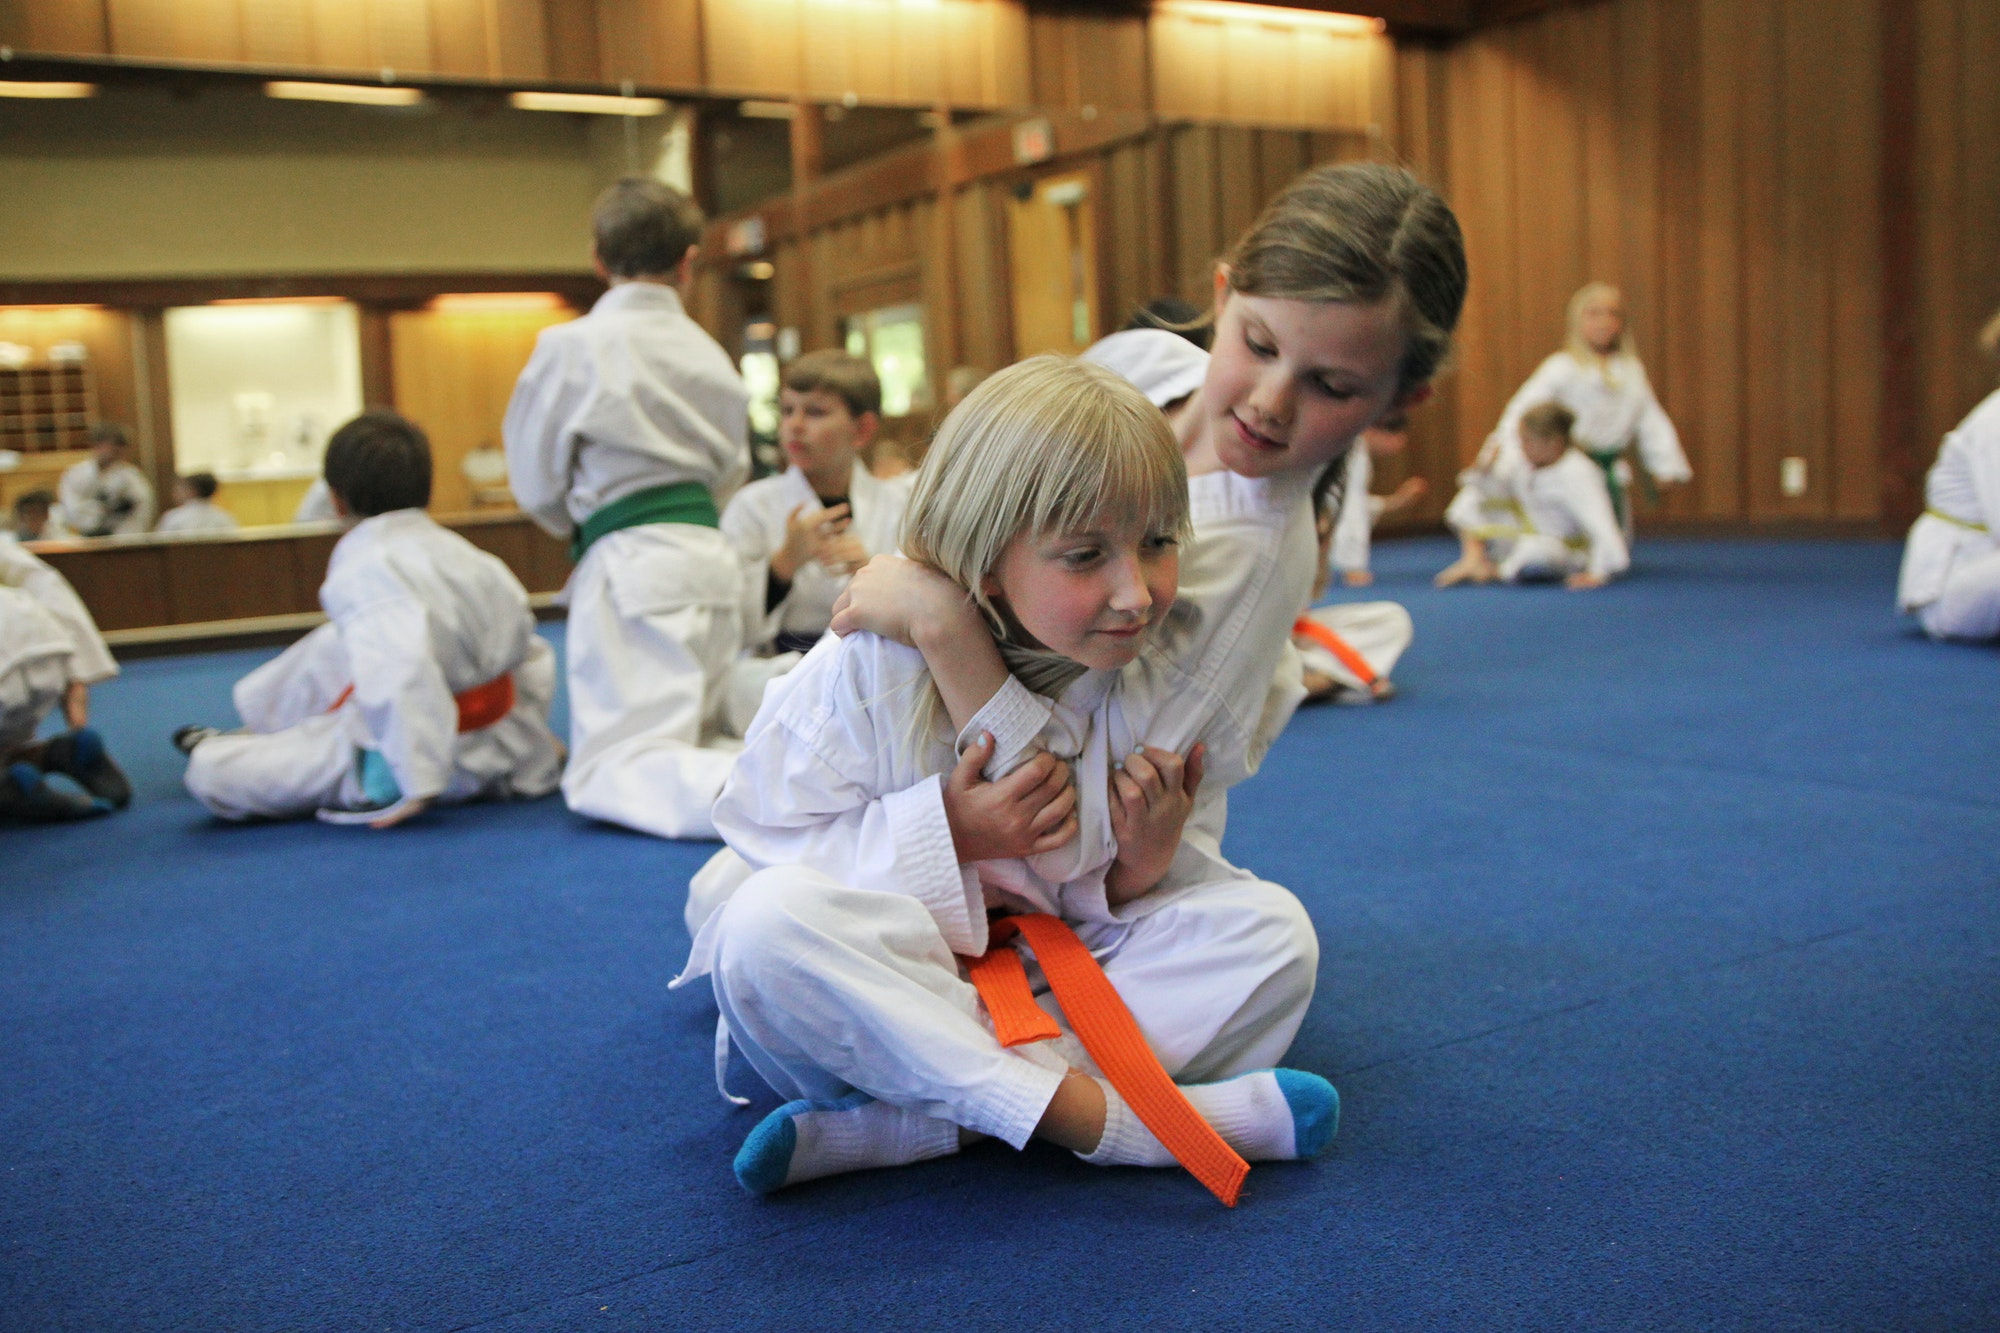 Kung Fu kiddos